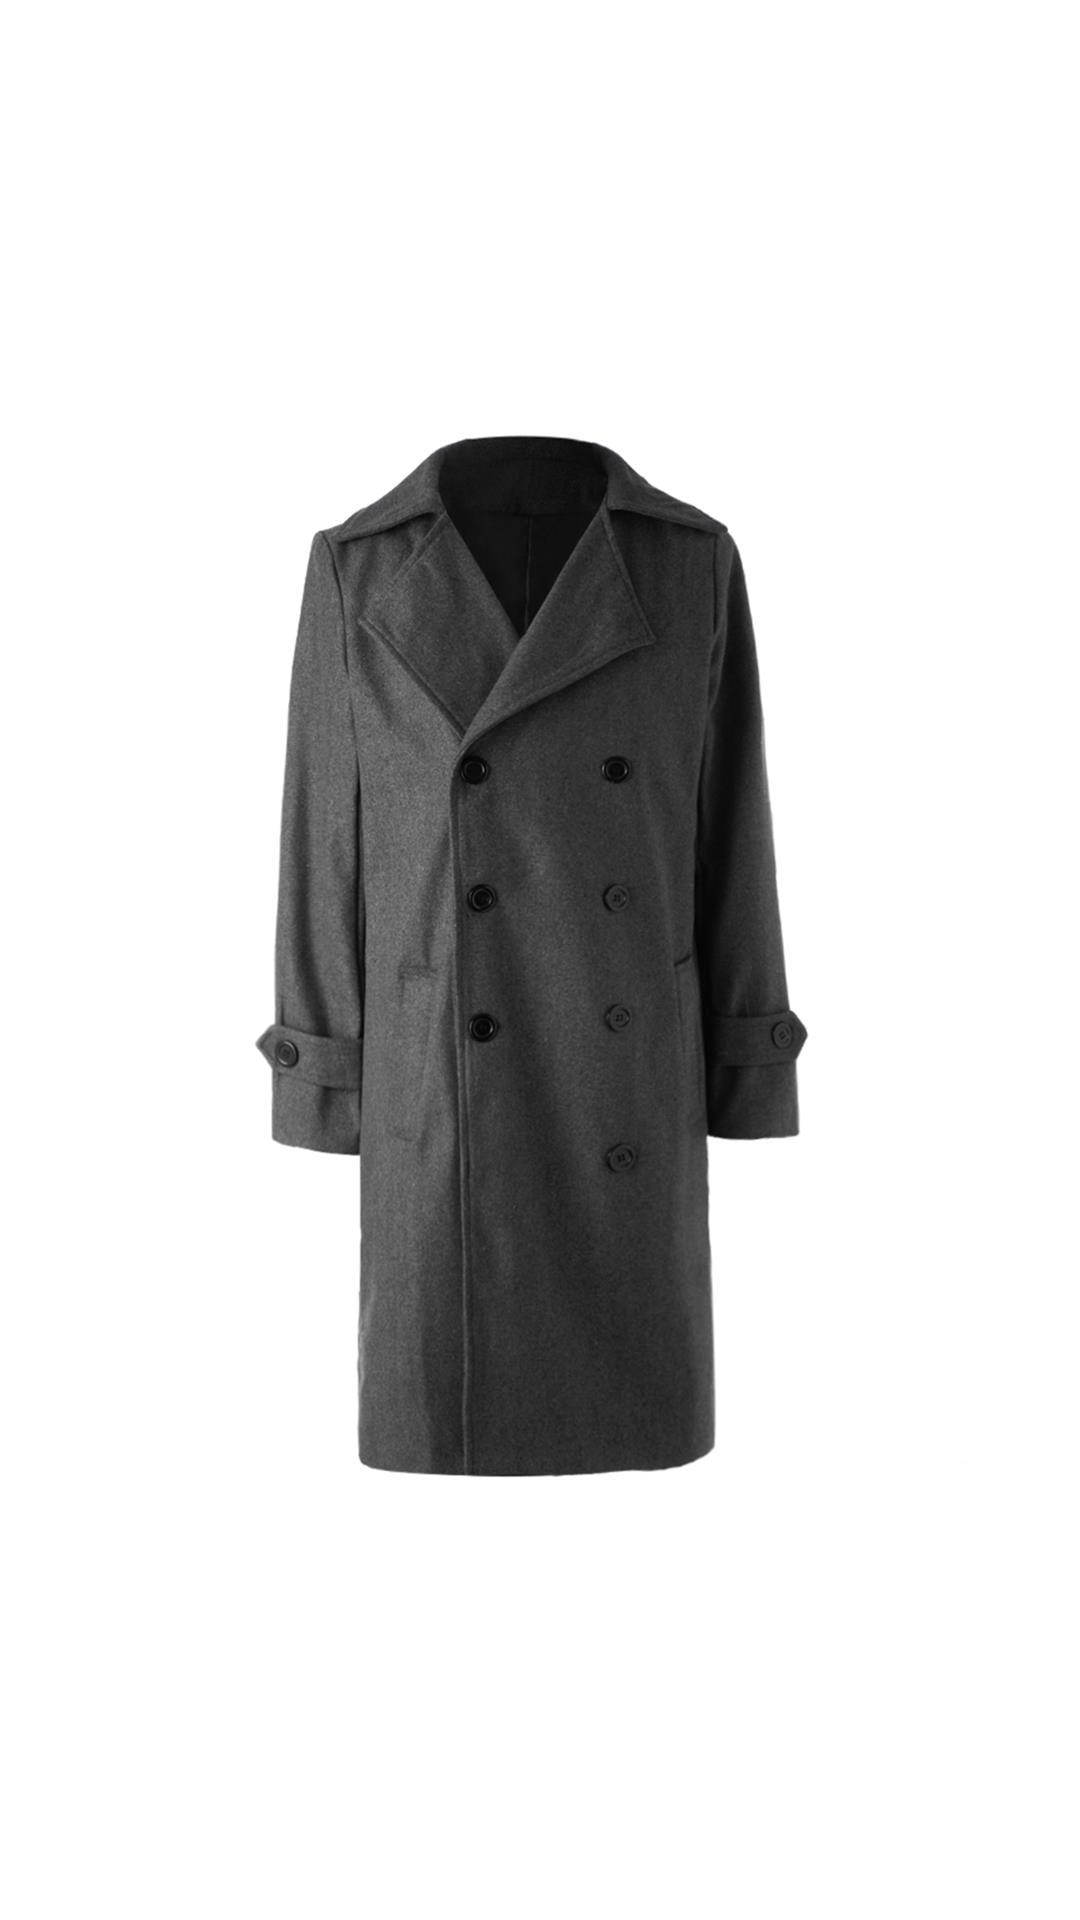 Turndown Collar Elegant Double Breasted Long Sleeves Woolen Trench Coat For Men